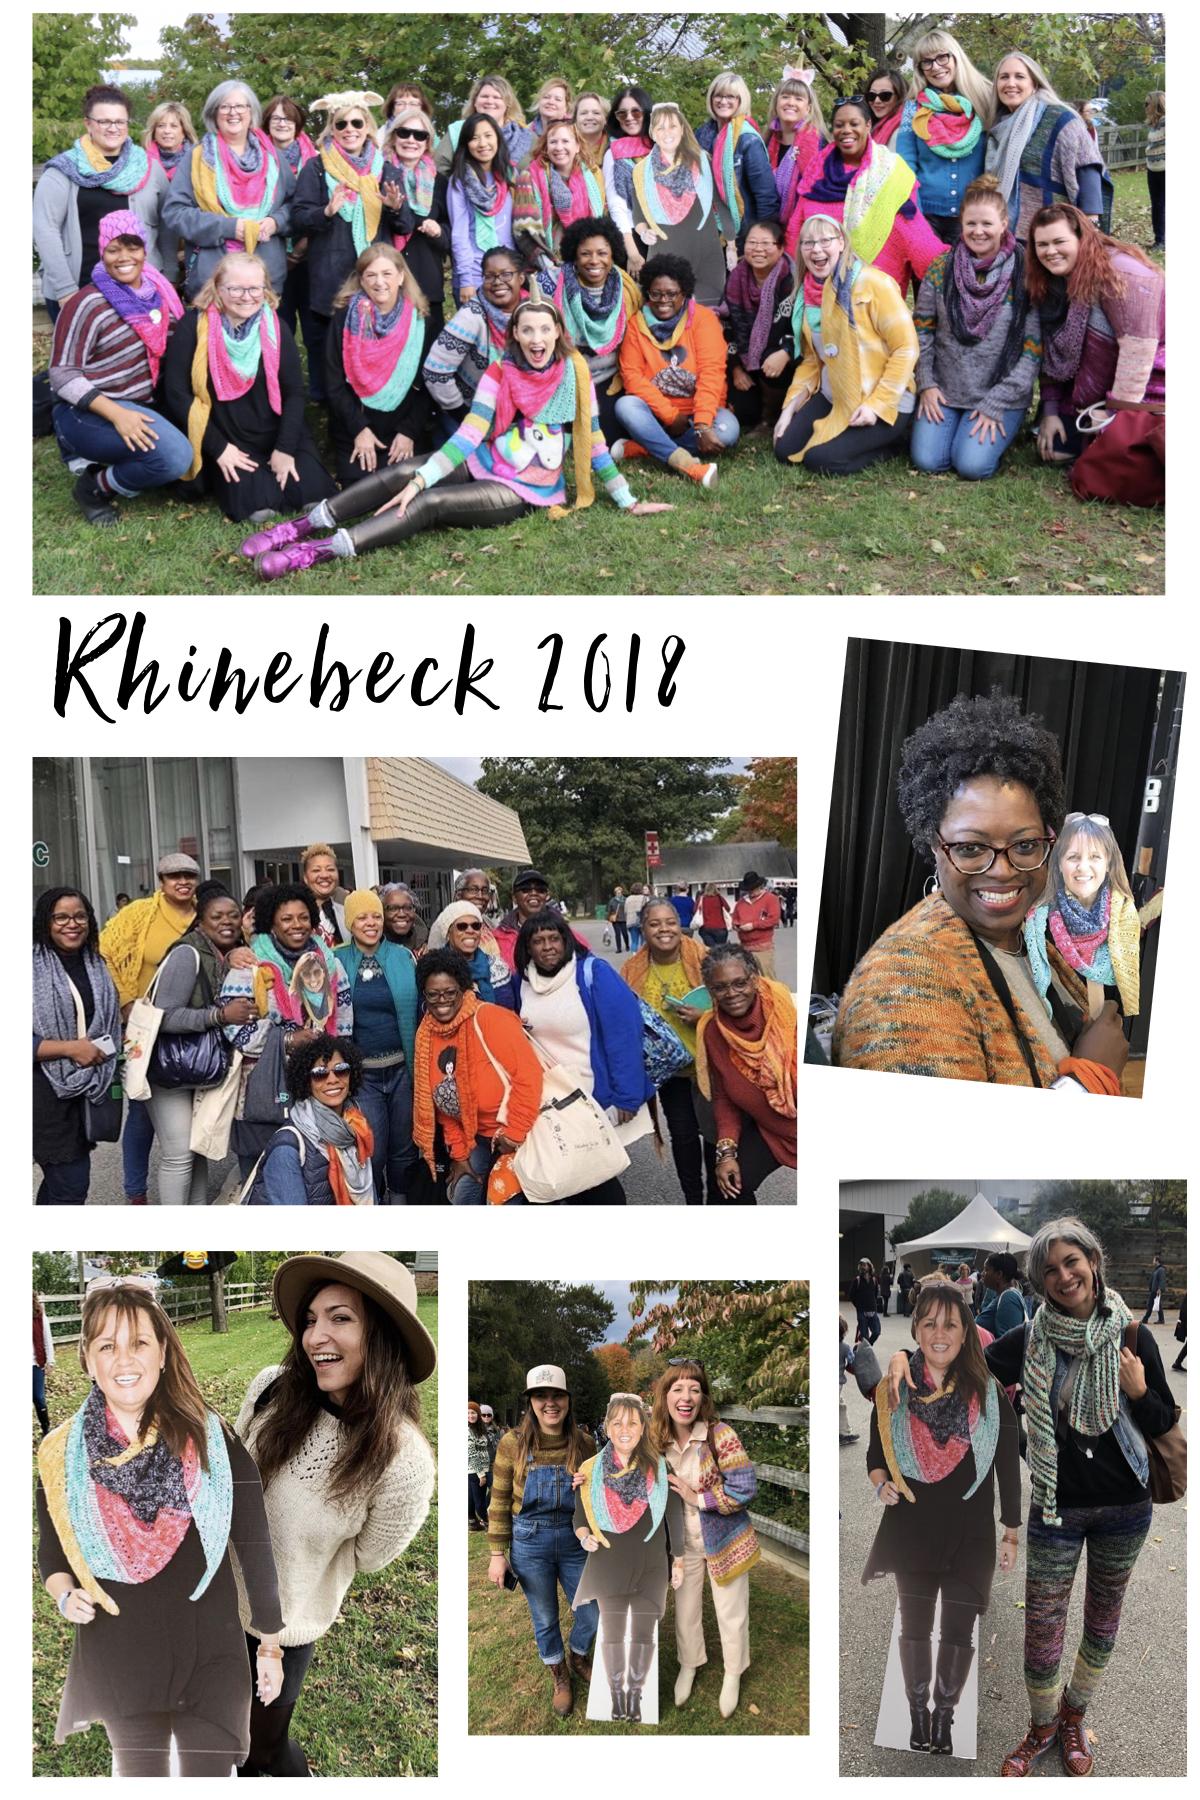 Unicornalong_At_NY_Sheep_and_wool_festival_Rhinebeck_2018_4.jpg